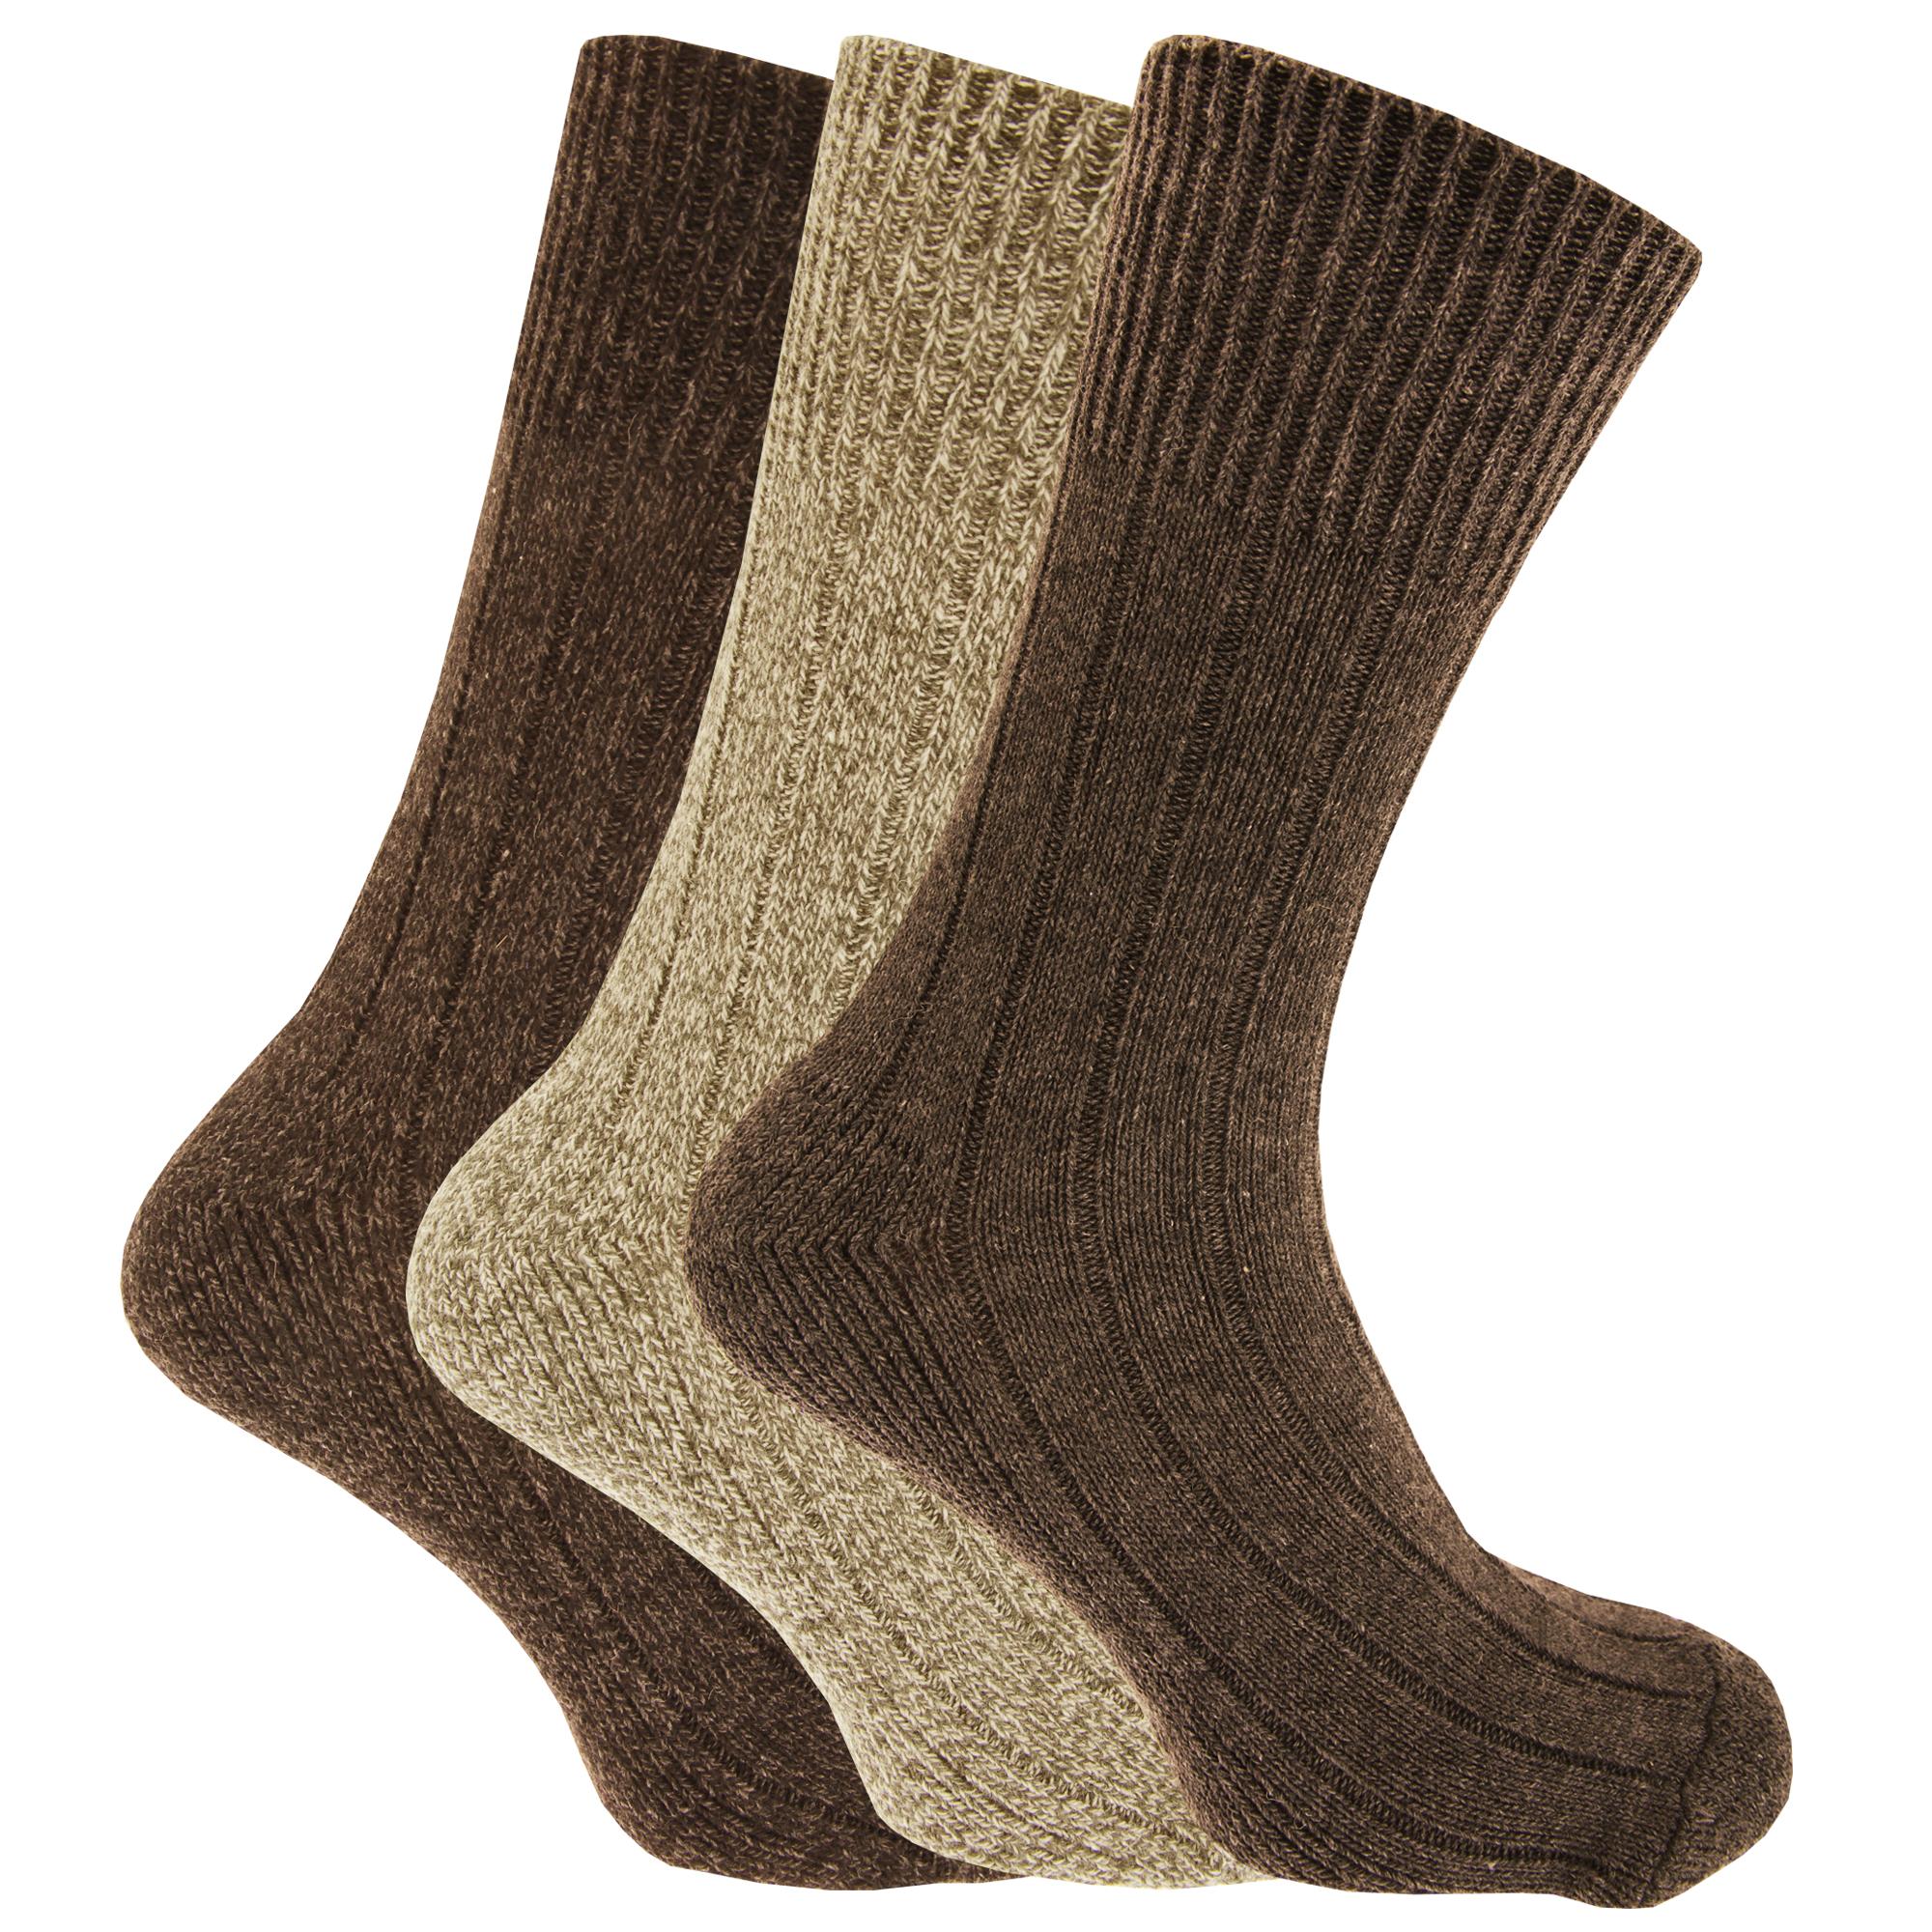 No Elastic Cotton Crew Socks - sears.com